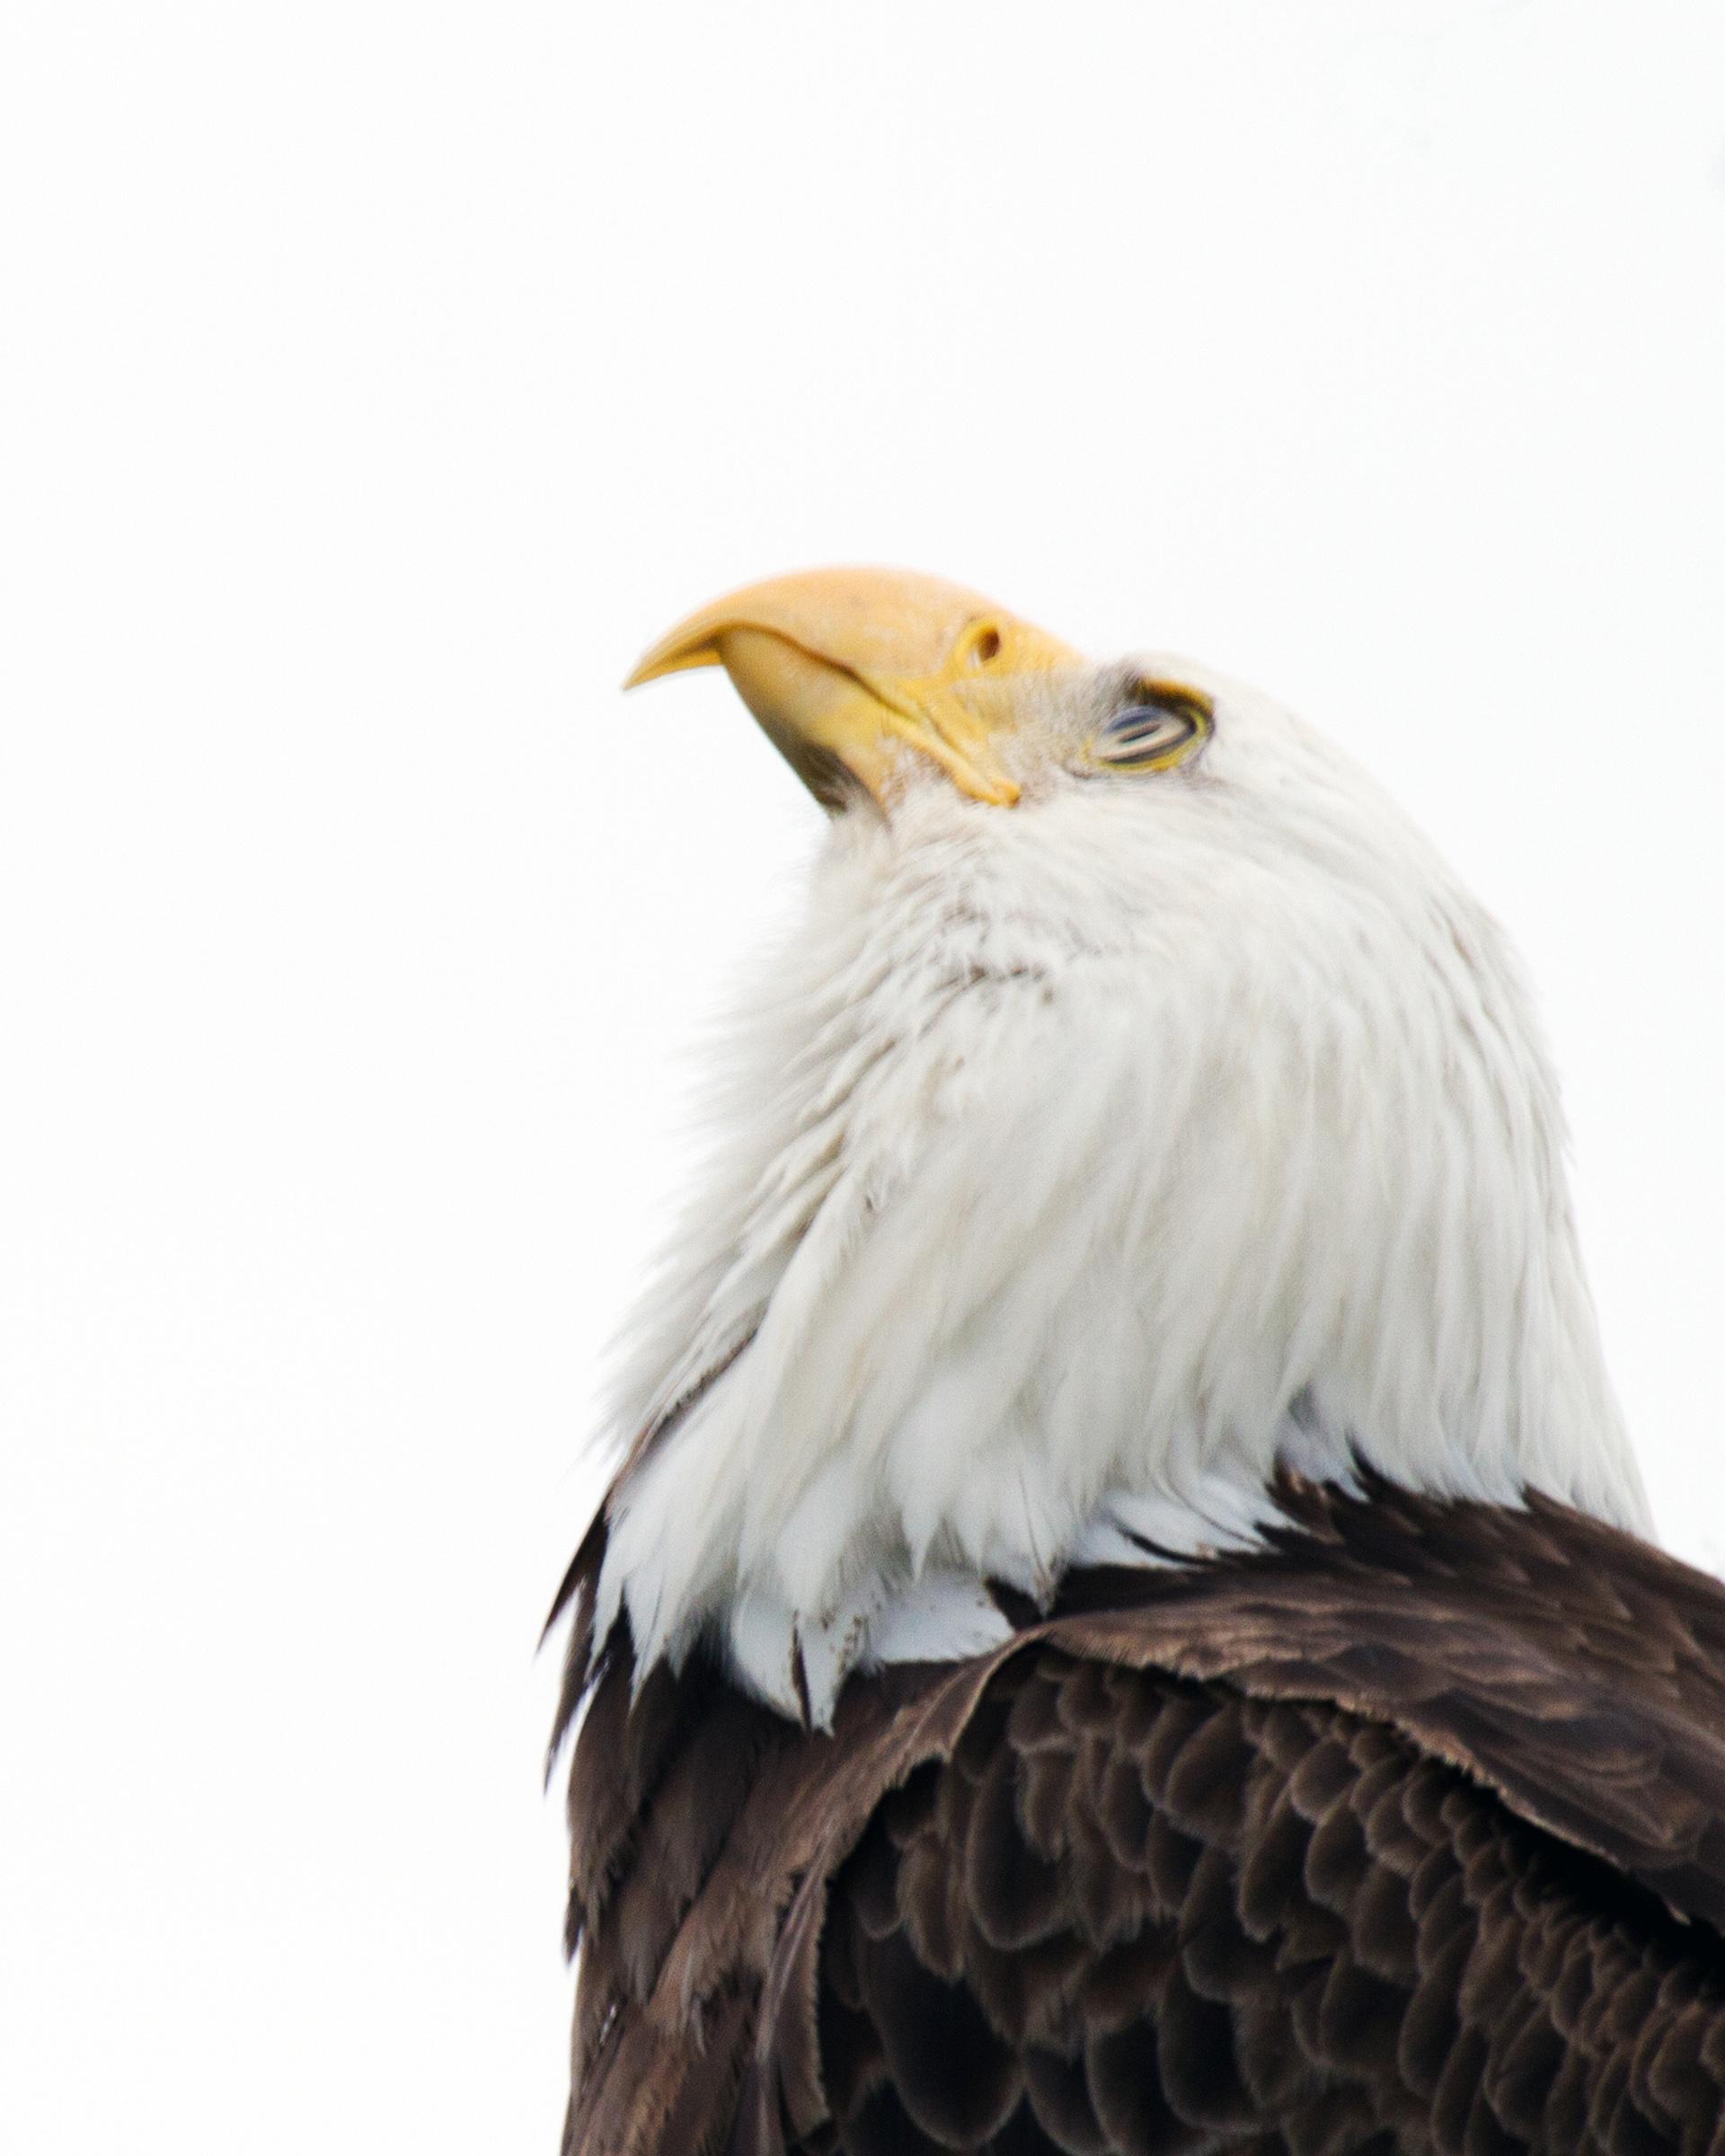 American Bald Eagle, America, Staring, Prey, Pygargue, HQ Photo